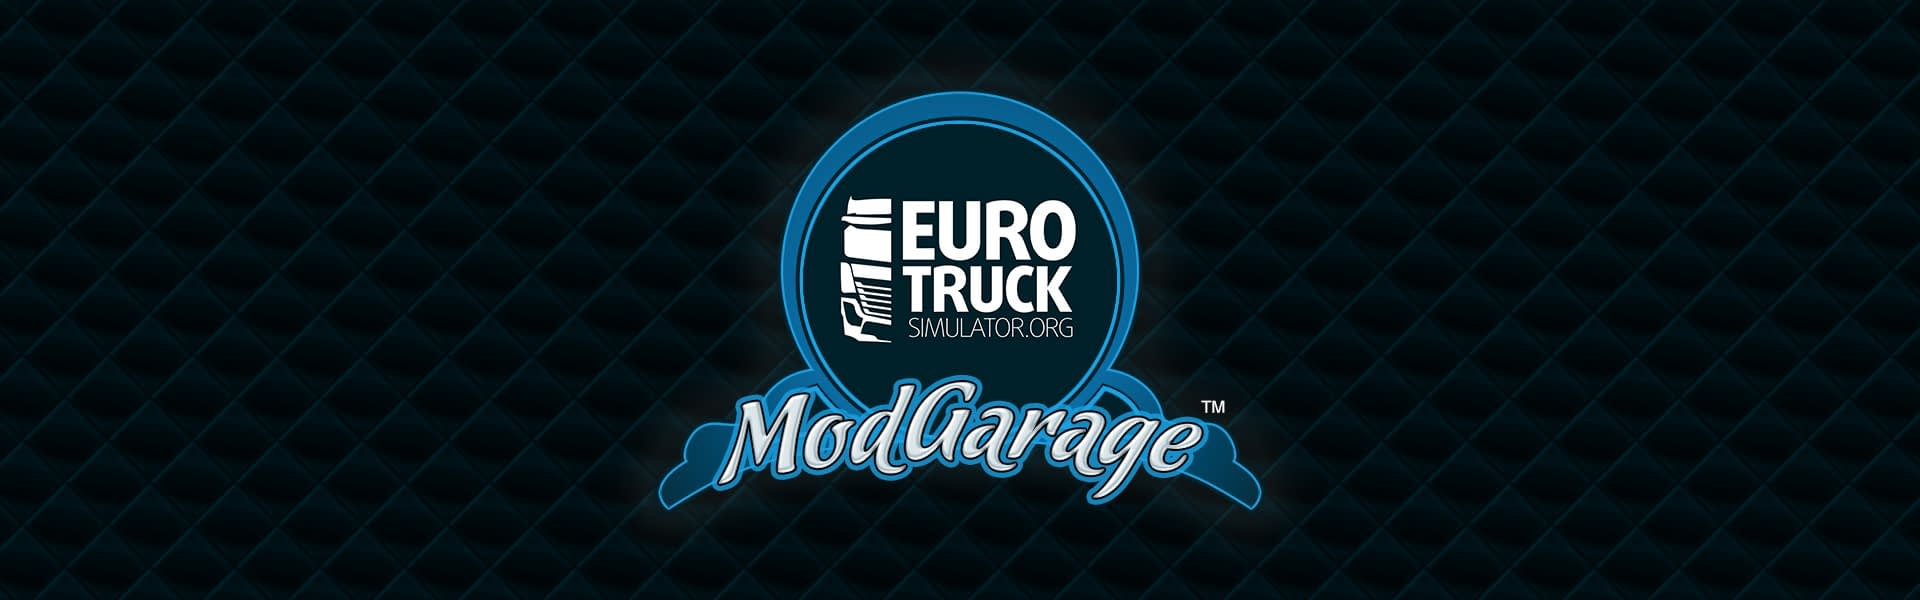 euro truck simulator 2 american truck simulator mod garage